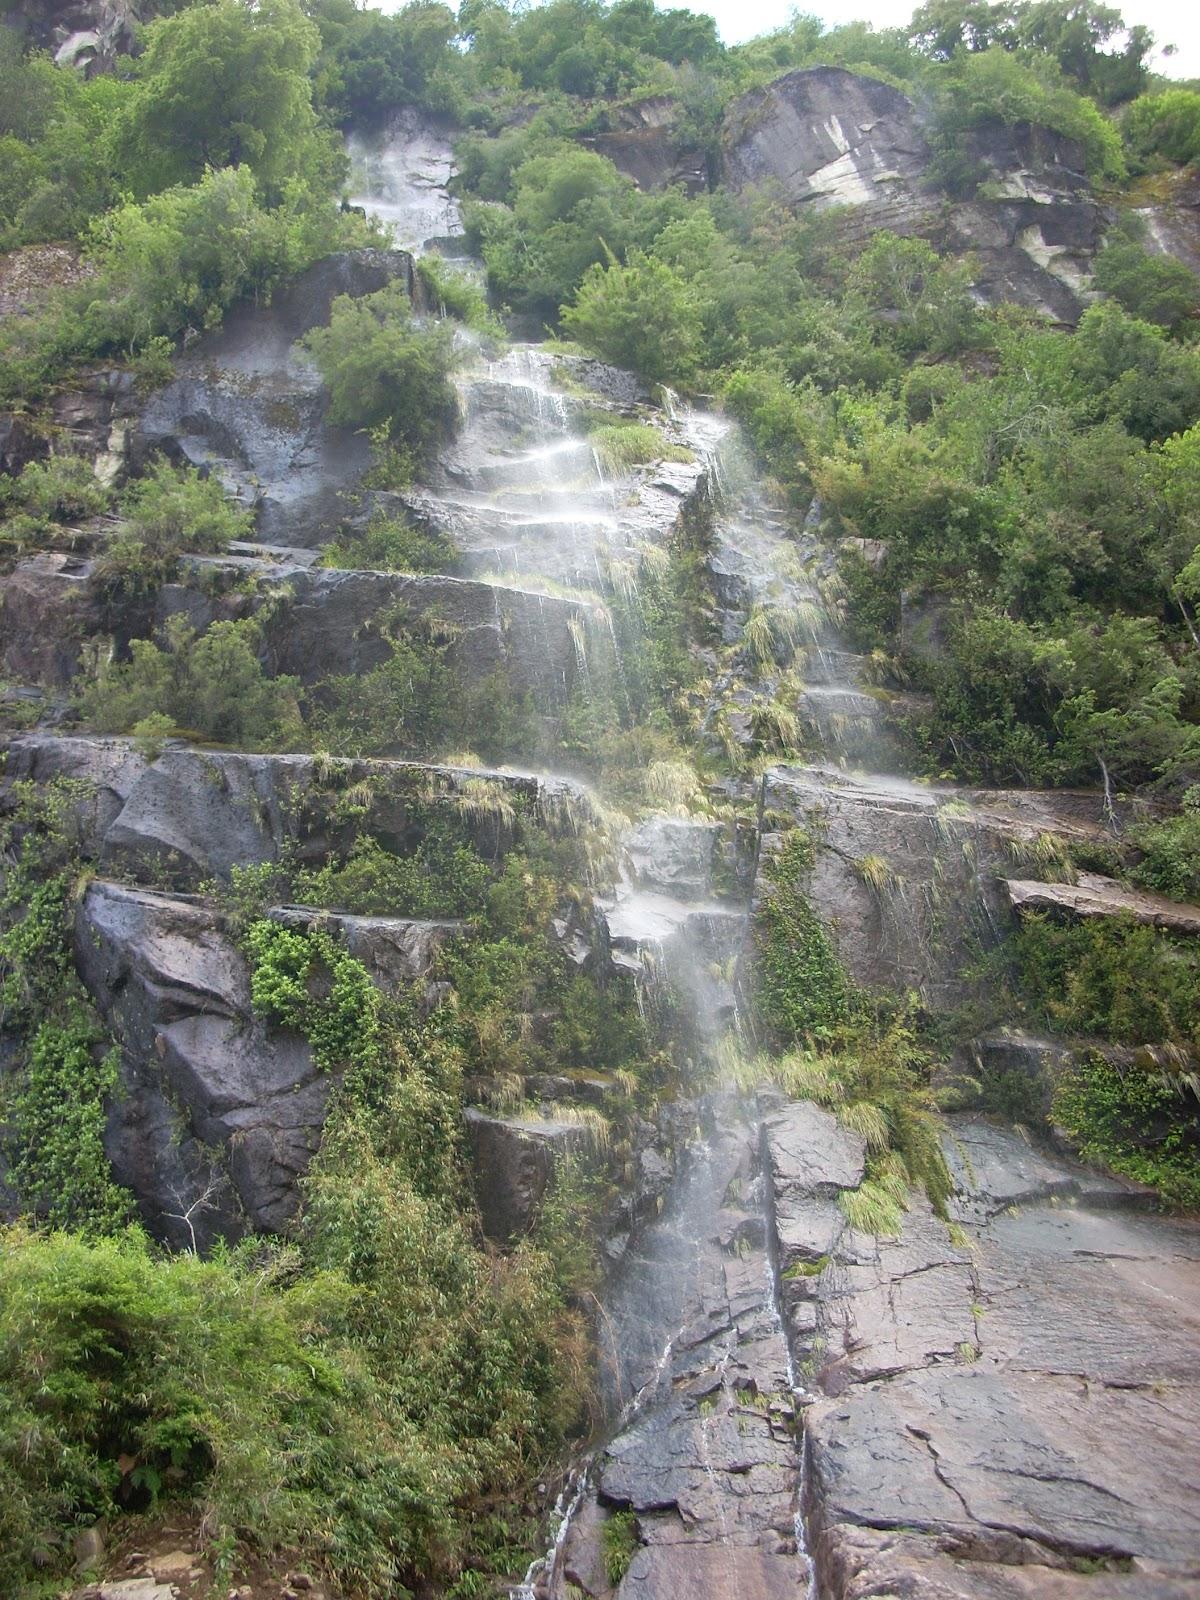 So many waterfalls here